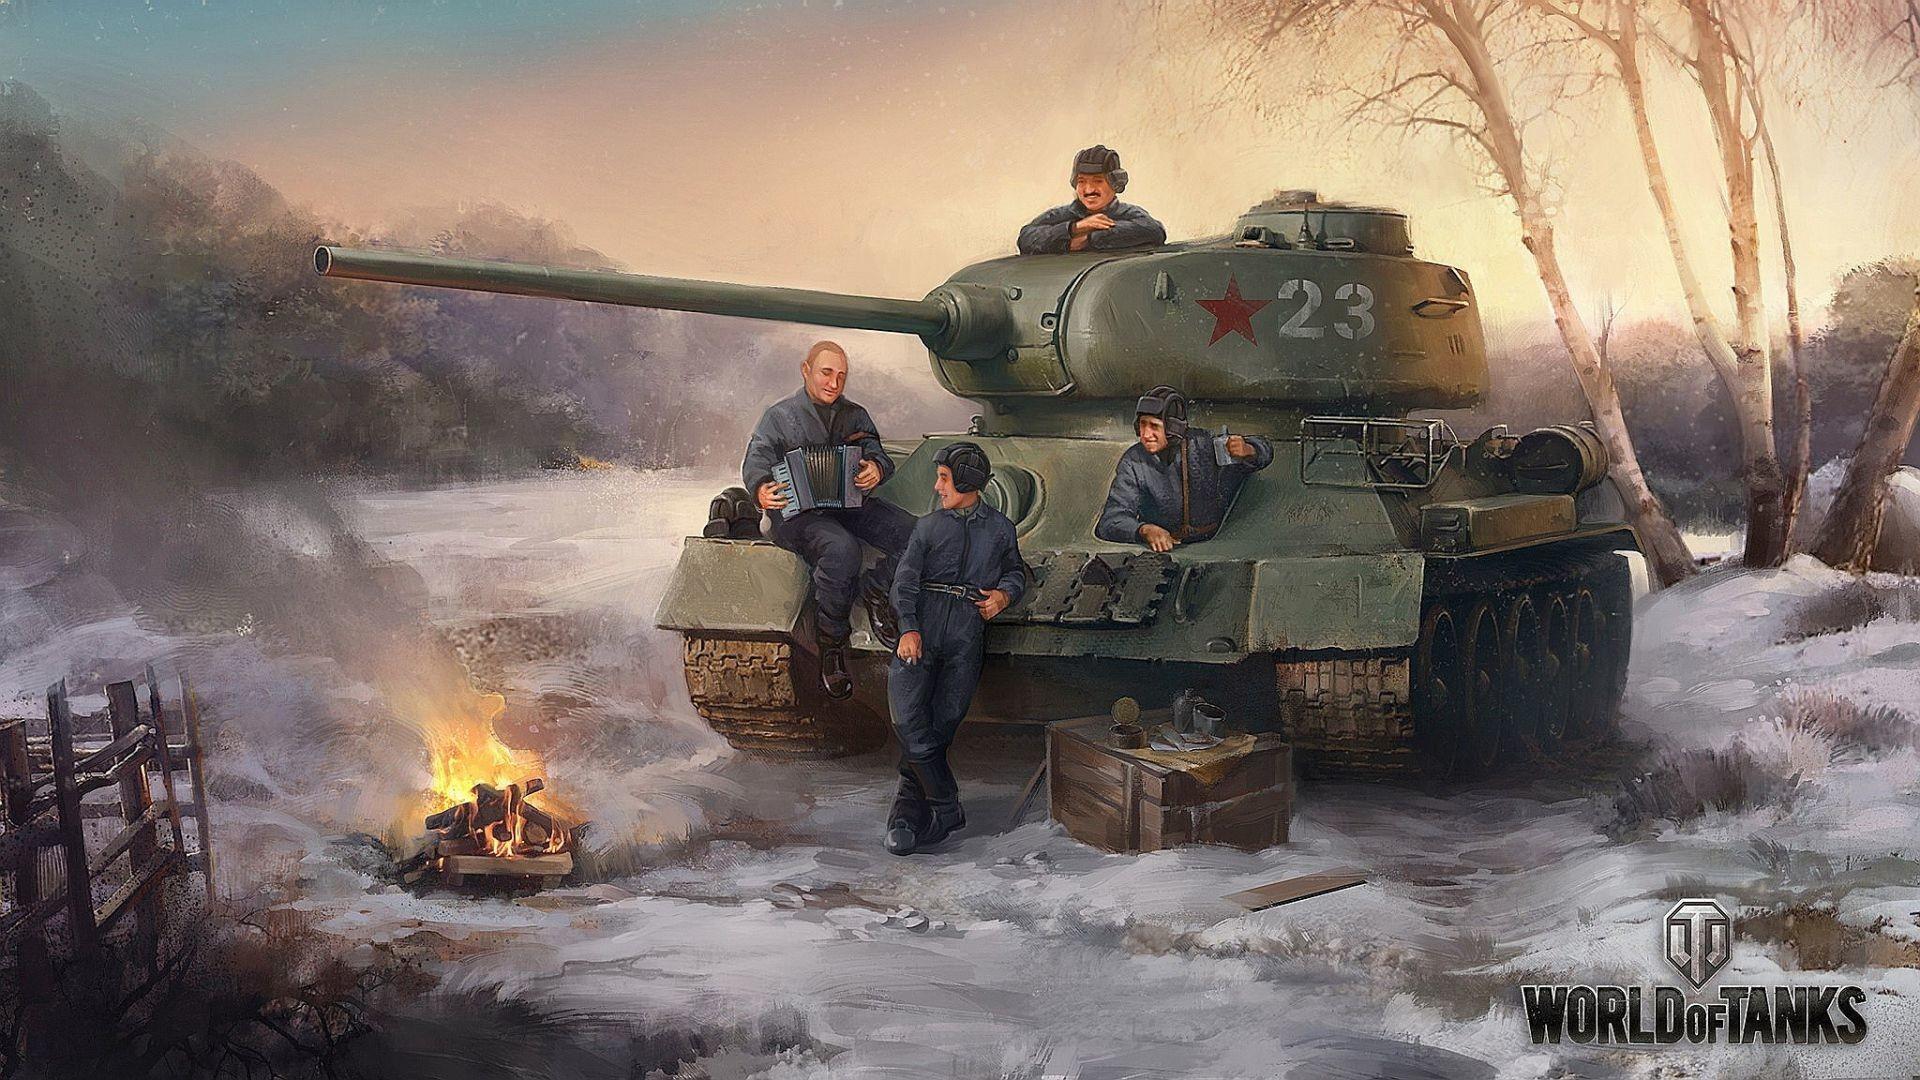 Res: 1920x1080, World War 2 Tank Wallpaper Desktop Background Extra 1080p